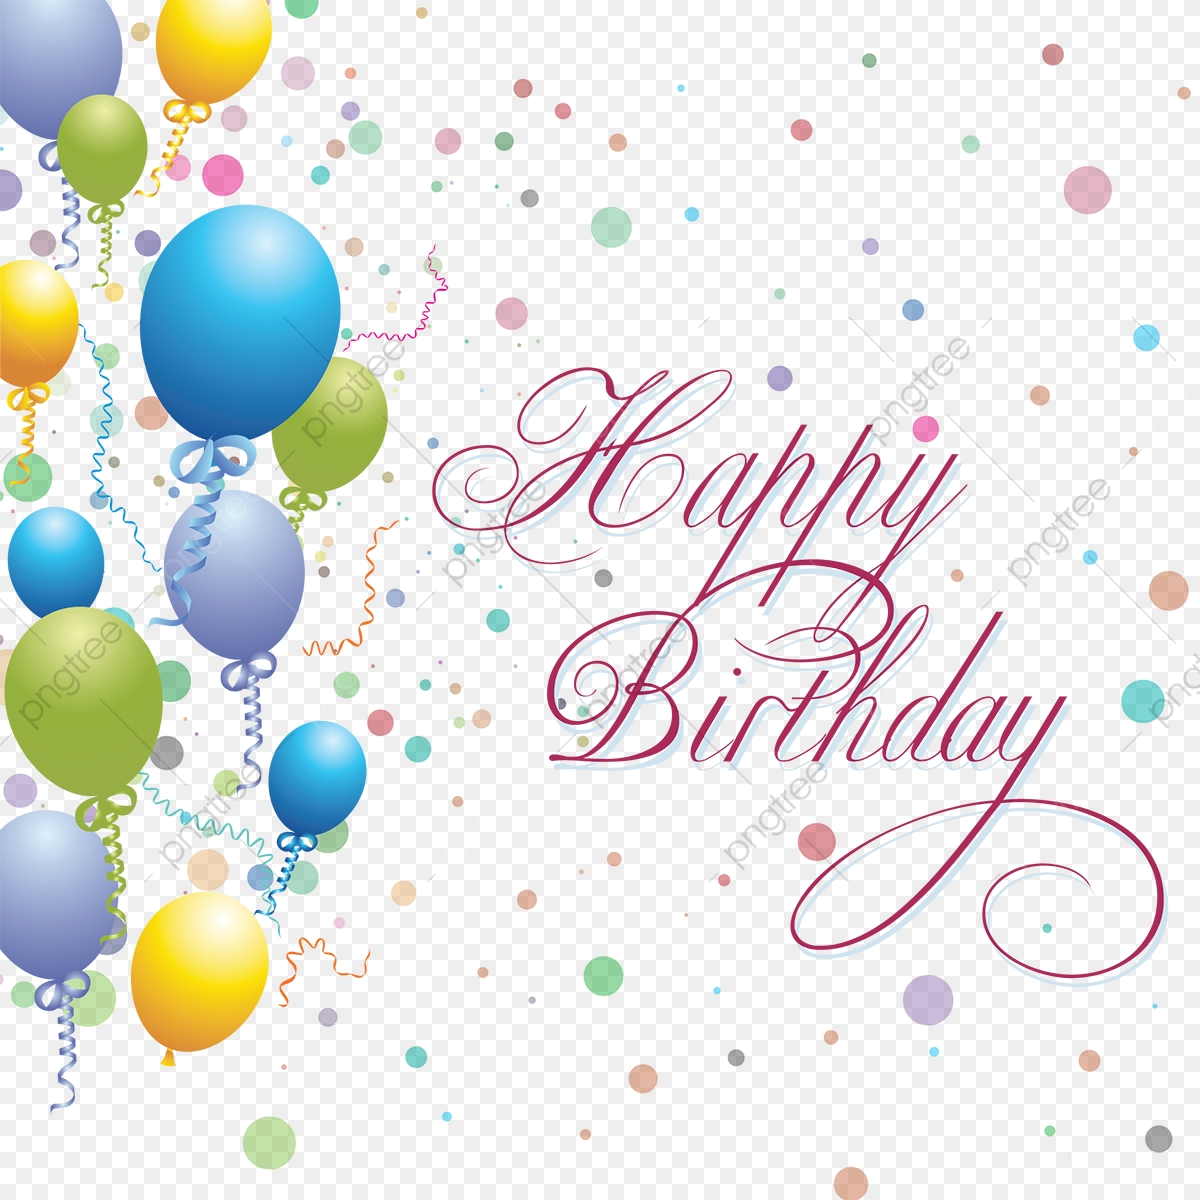 Happy Birthday Balloons Background, Background, Ballons, Birthday.